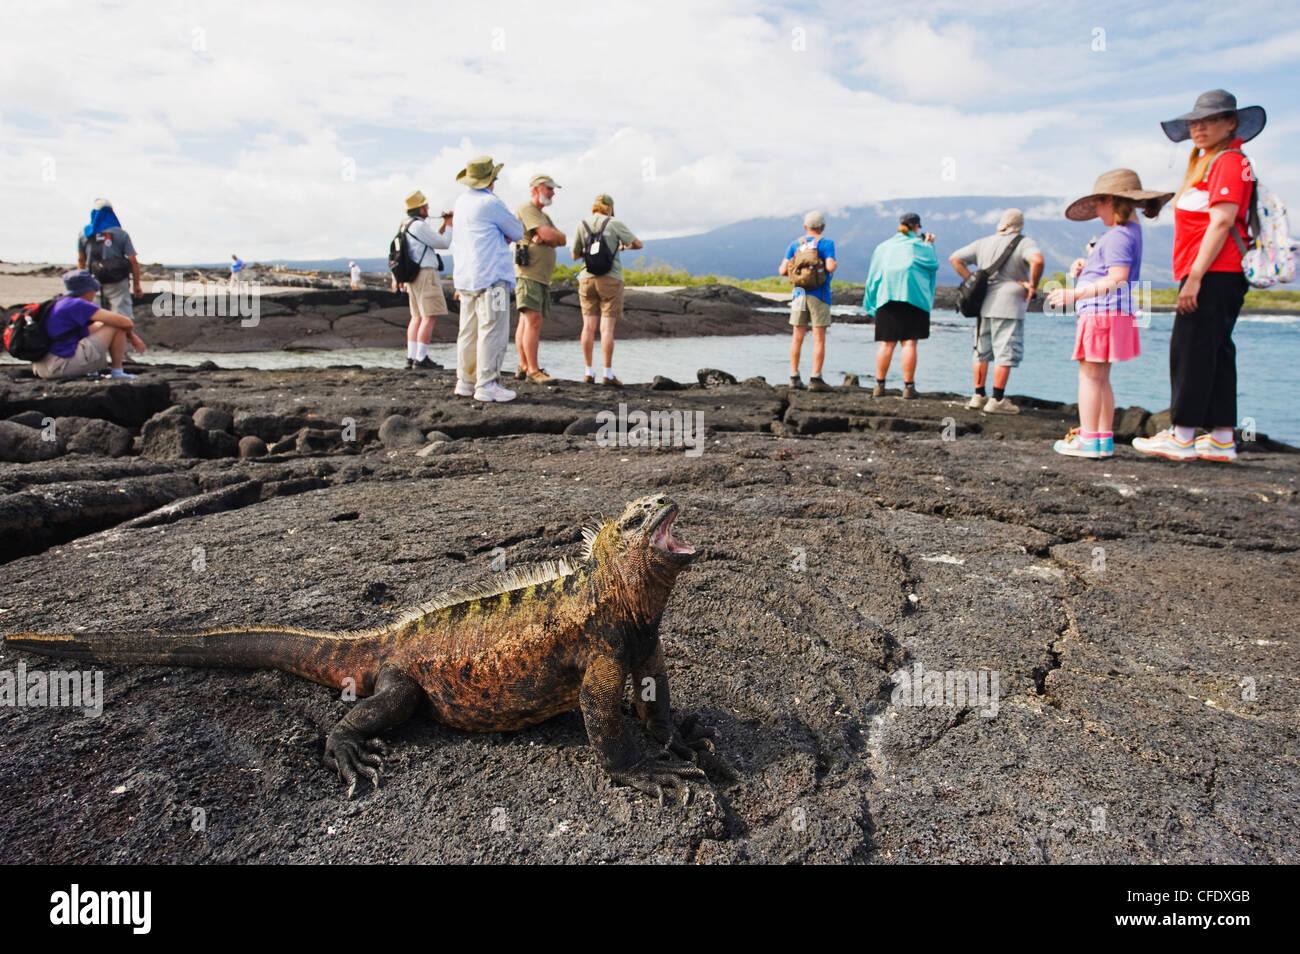 Tourists looking at marine iguanas (Amblyrhynchus cristatus), Isla Isabela, Galapagos Islands, Ecuador - Stock Image